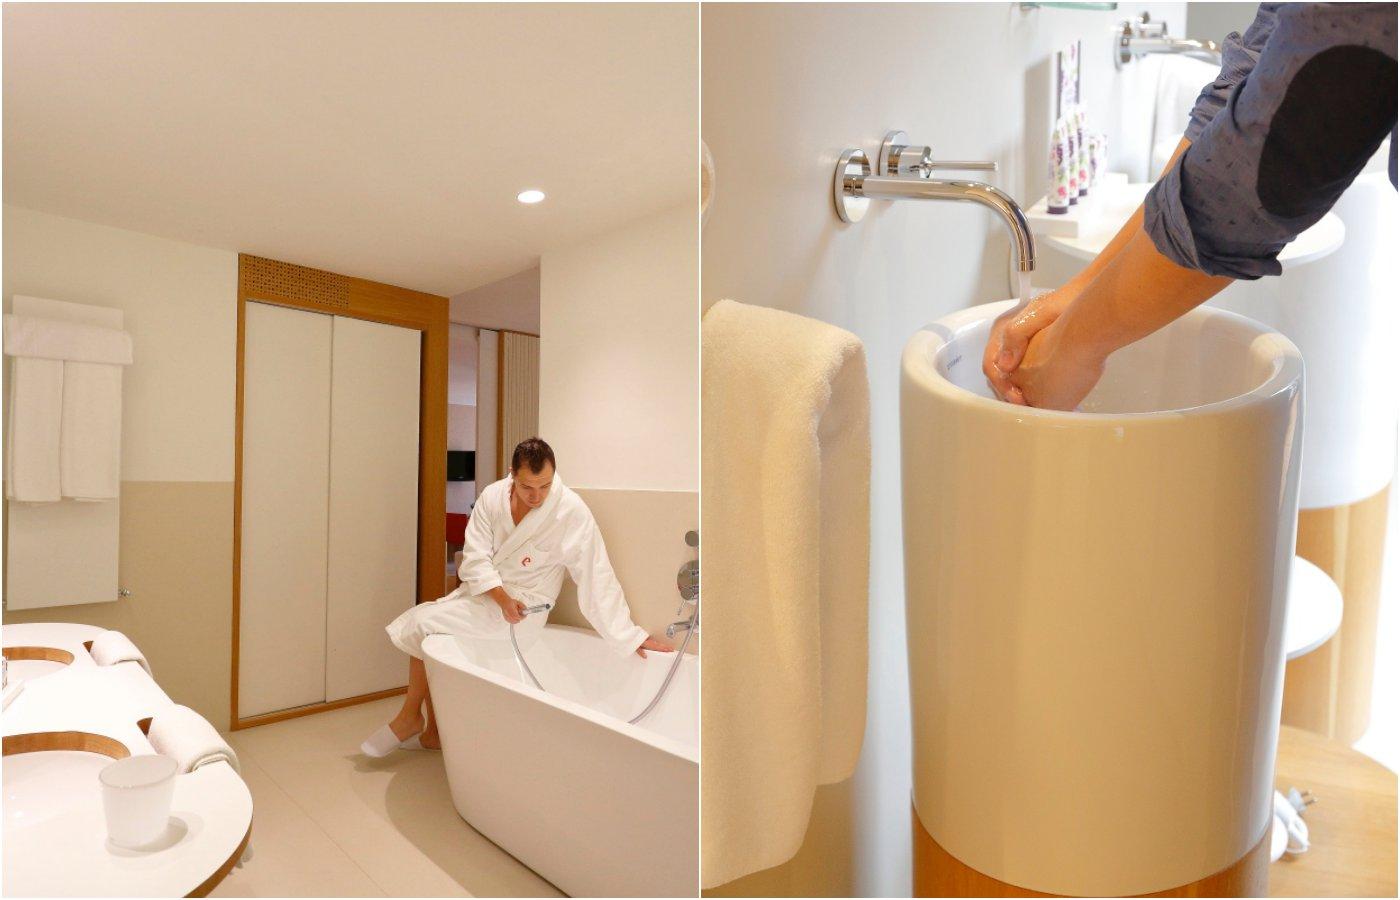 Hotel Echaurren. Baño y lavabo vertical